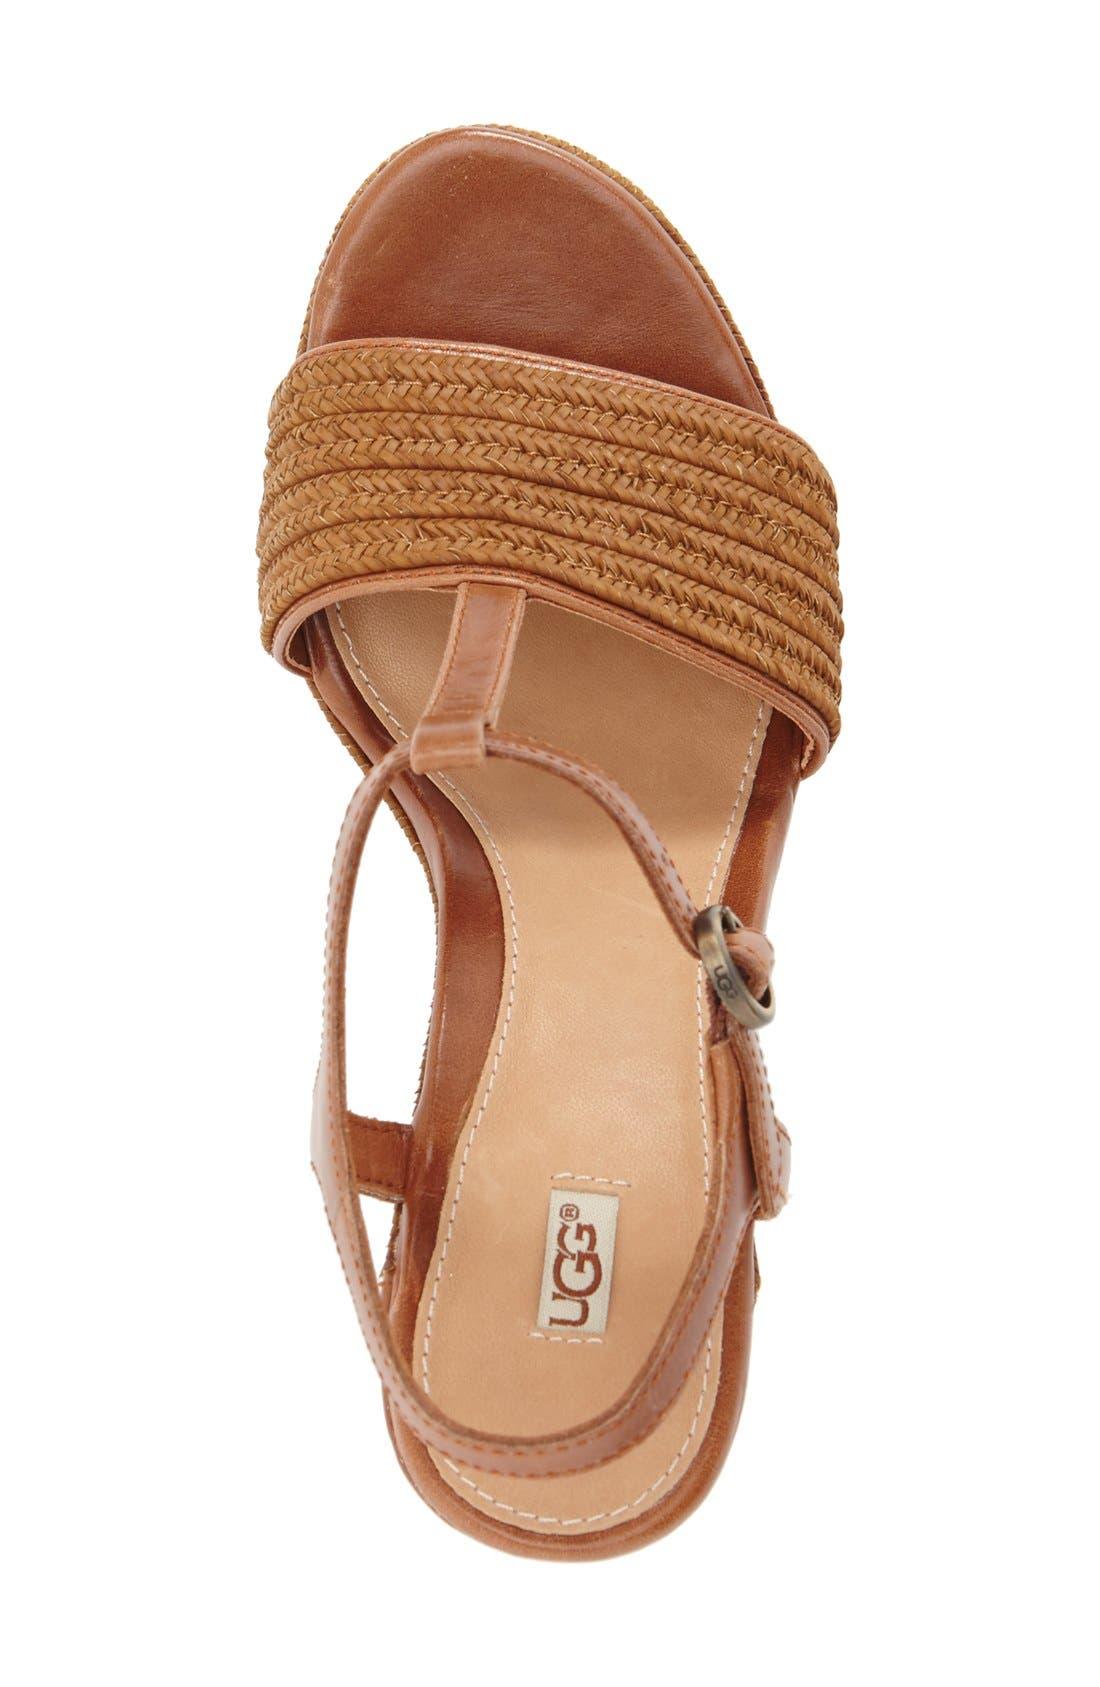 Alternate Image 3  - UGG® 'Fitchie' T-Strap Wedge Sandal (Women)